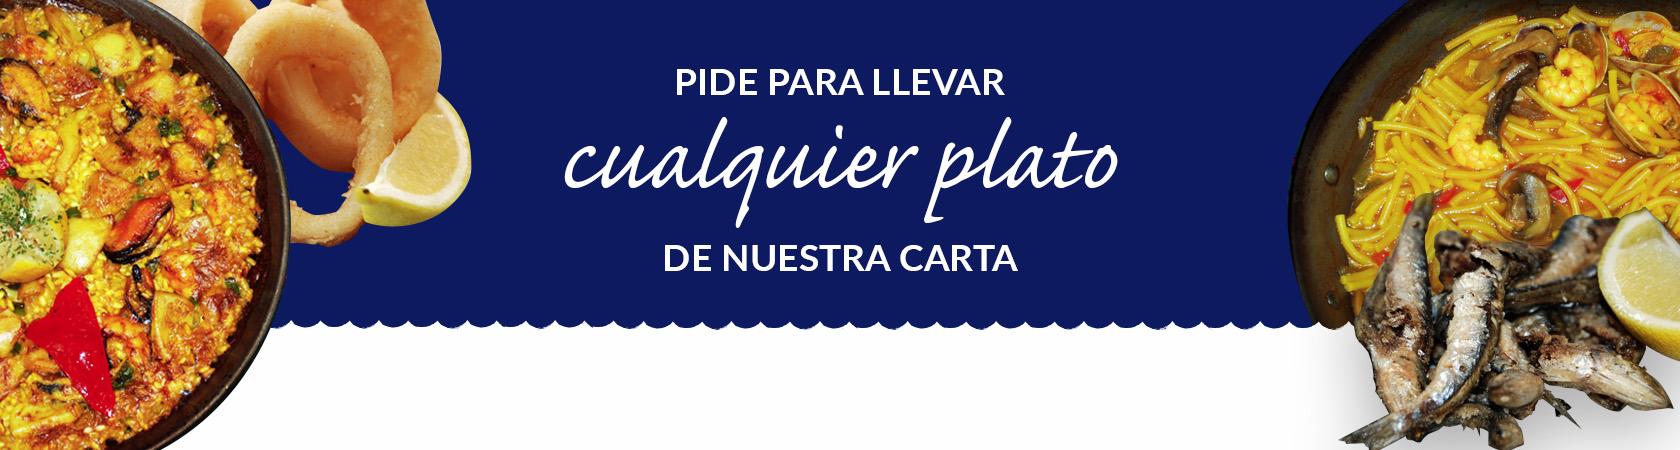 cabecera_mar_comida-llevarV2